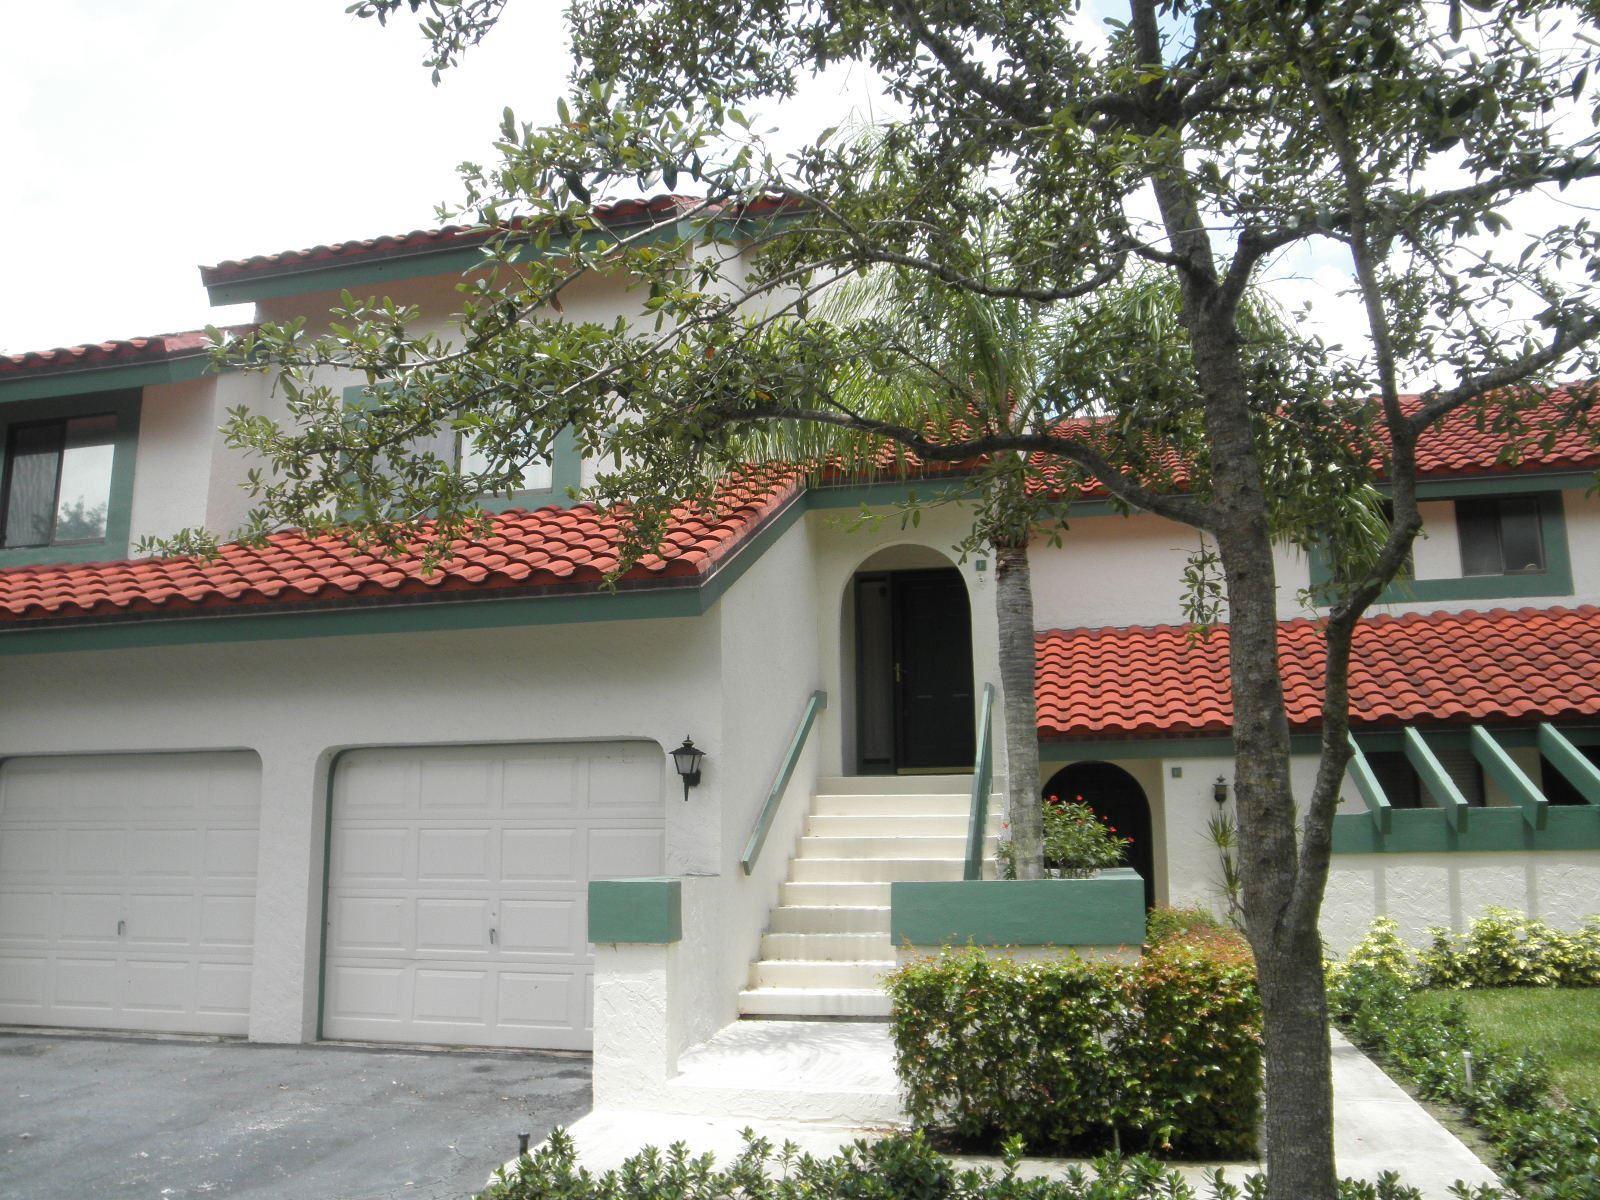 25 Lexington F Lane W #F, Palm Beach Gardens, FL 33418 - MLS#: RX-10707342